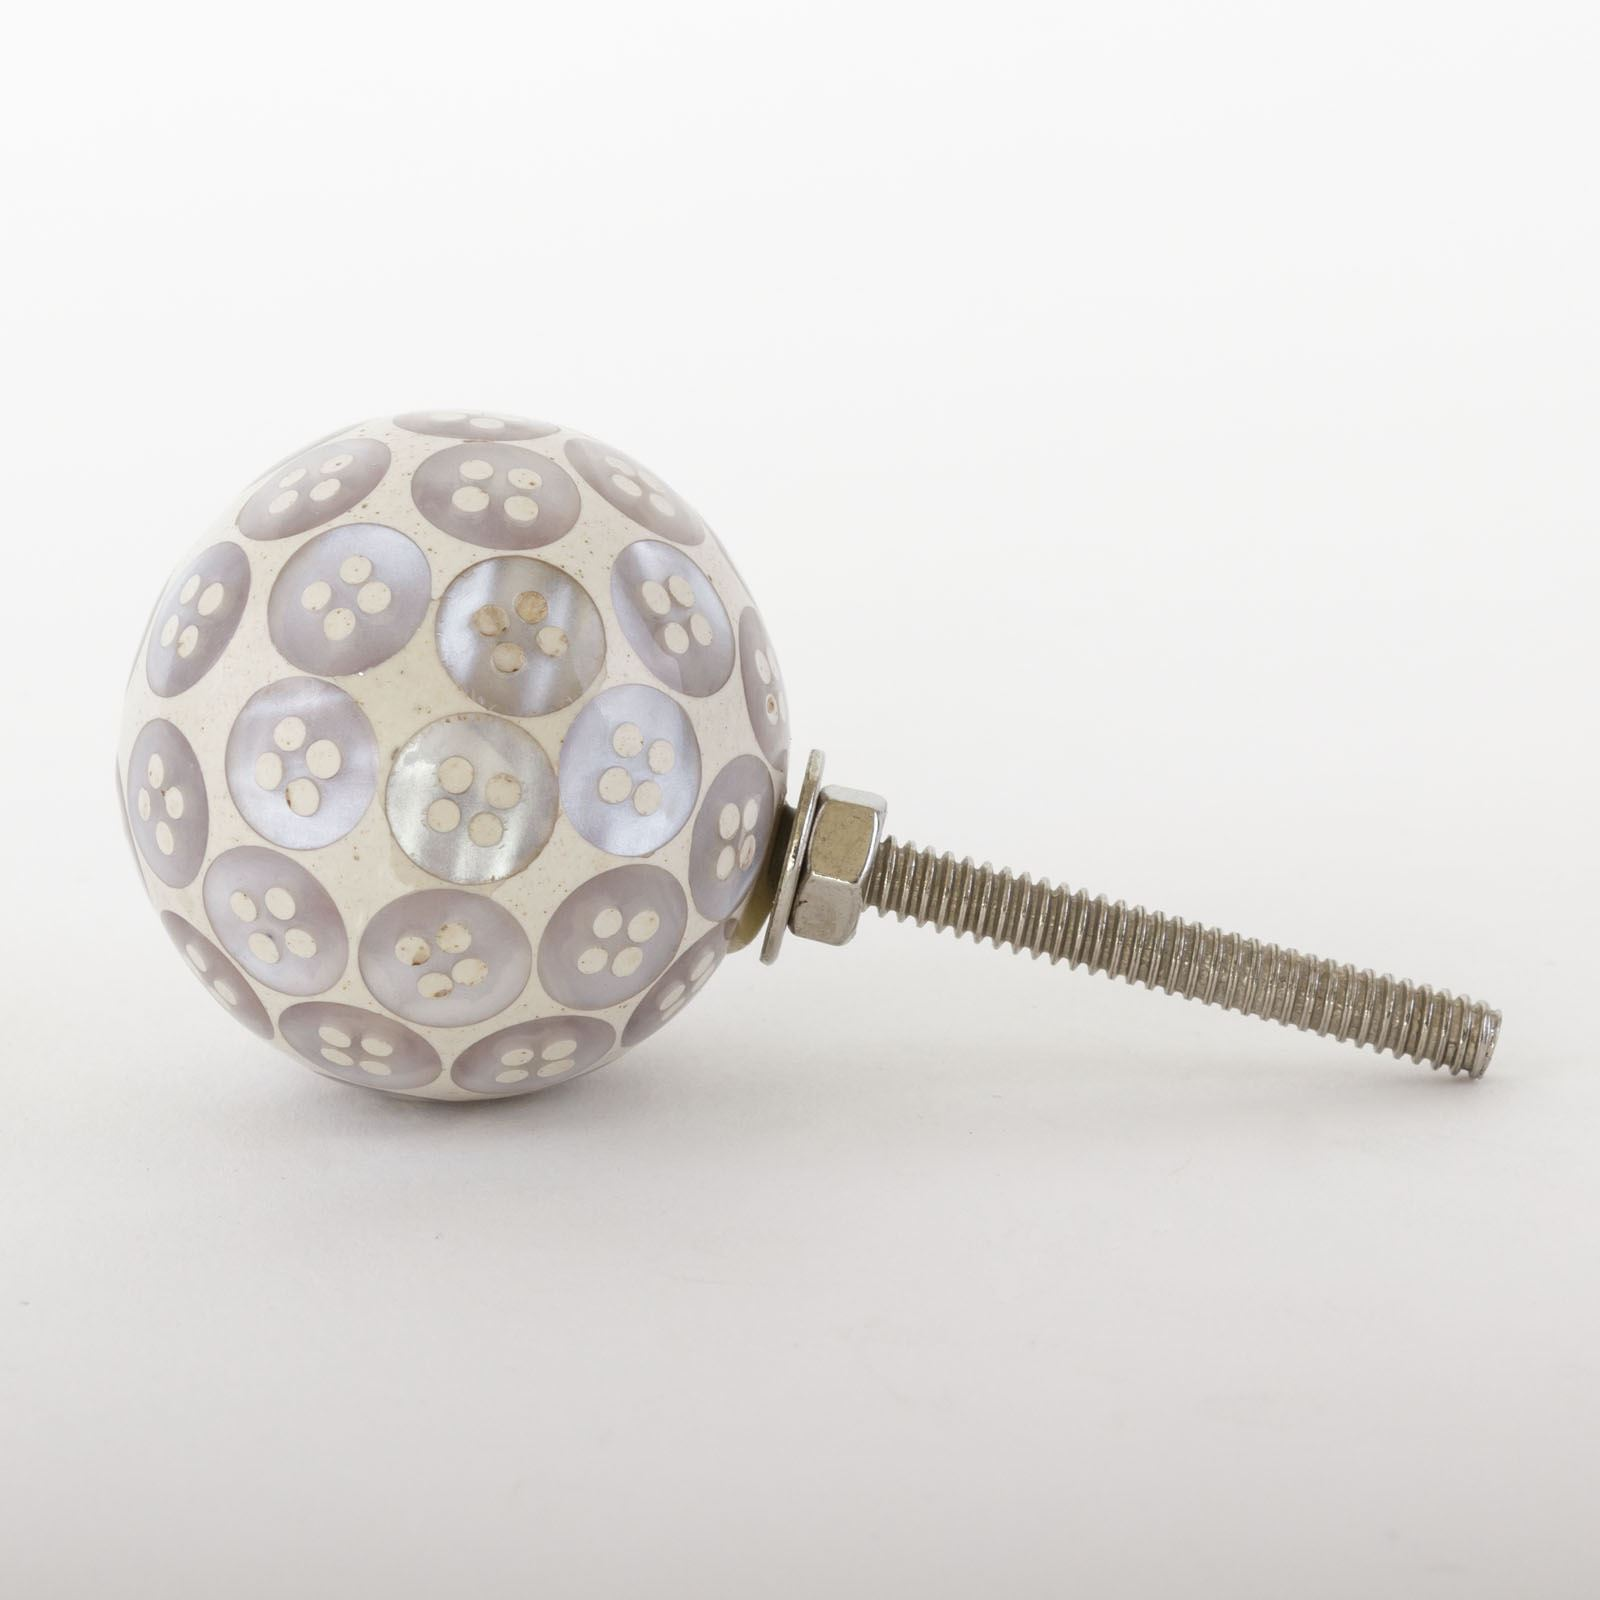 Dots-amp-Stripes-Ceramic-Door-Knobs-Handles-Furniture-Drawer-Pulls-Cupboard miniatura 45